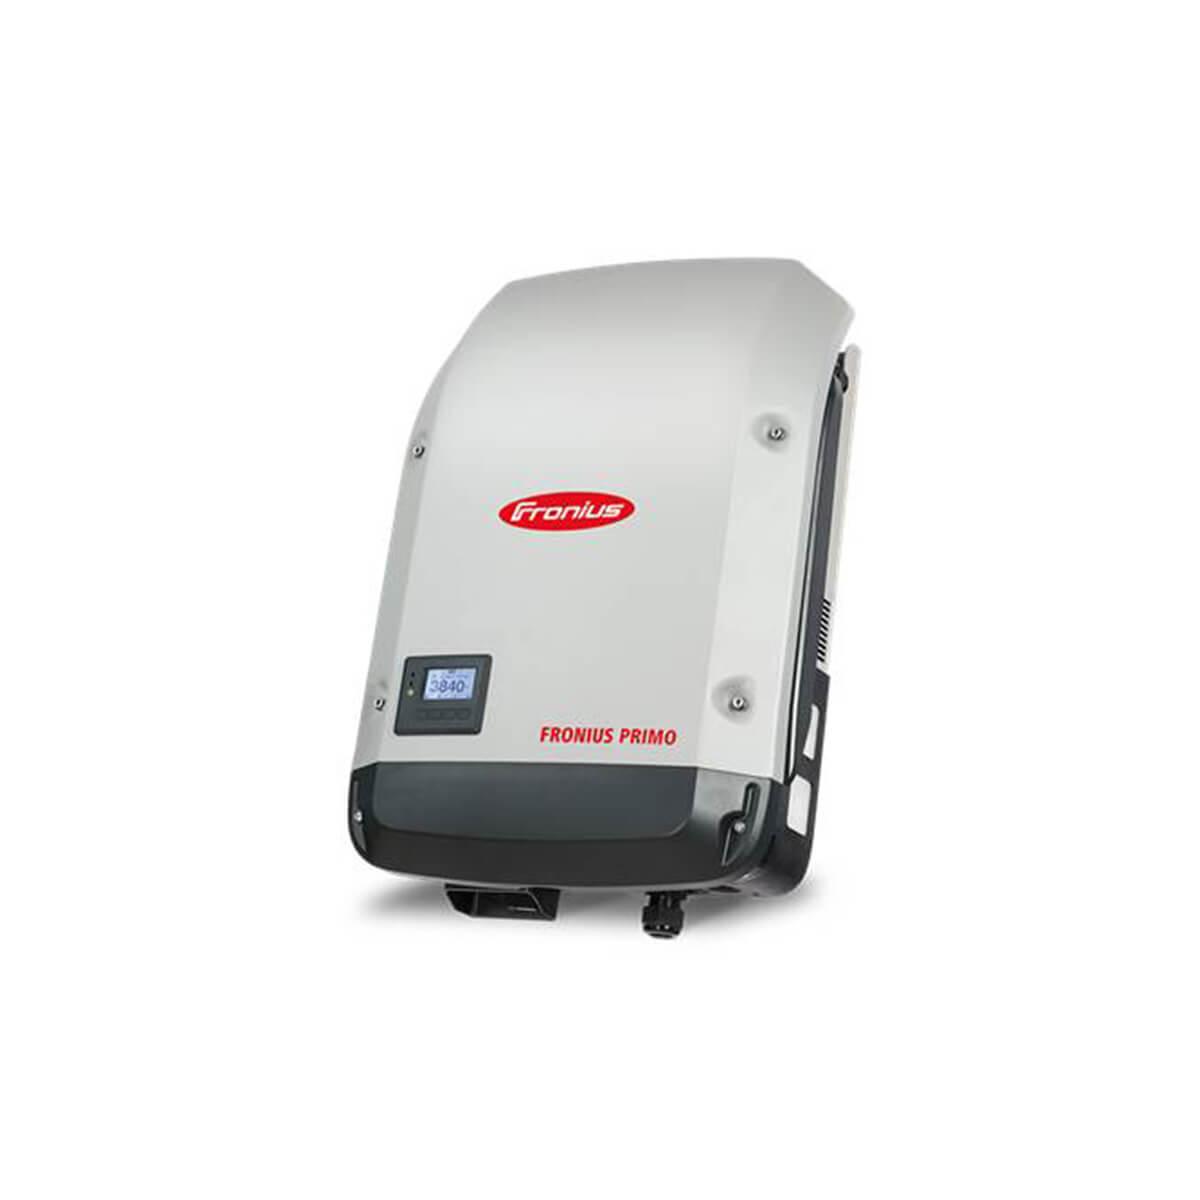 fronius 4.6kW inverter, fronius primo 4.6kW inverter, fronius primo 4.6-1 inverter, fronius primo 4.6-1, fronius primo 4.6 kW, FRONIUS 4.6 KW